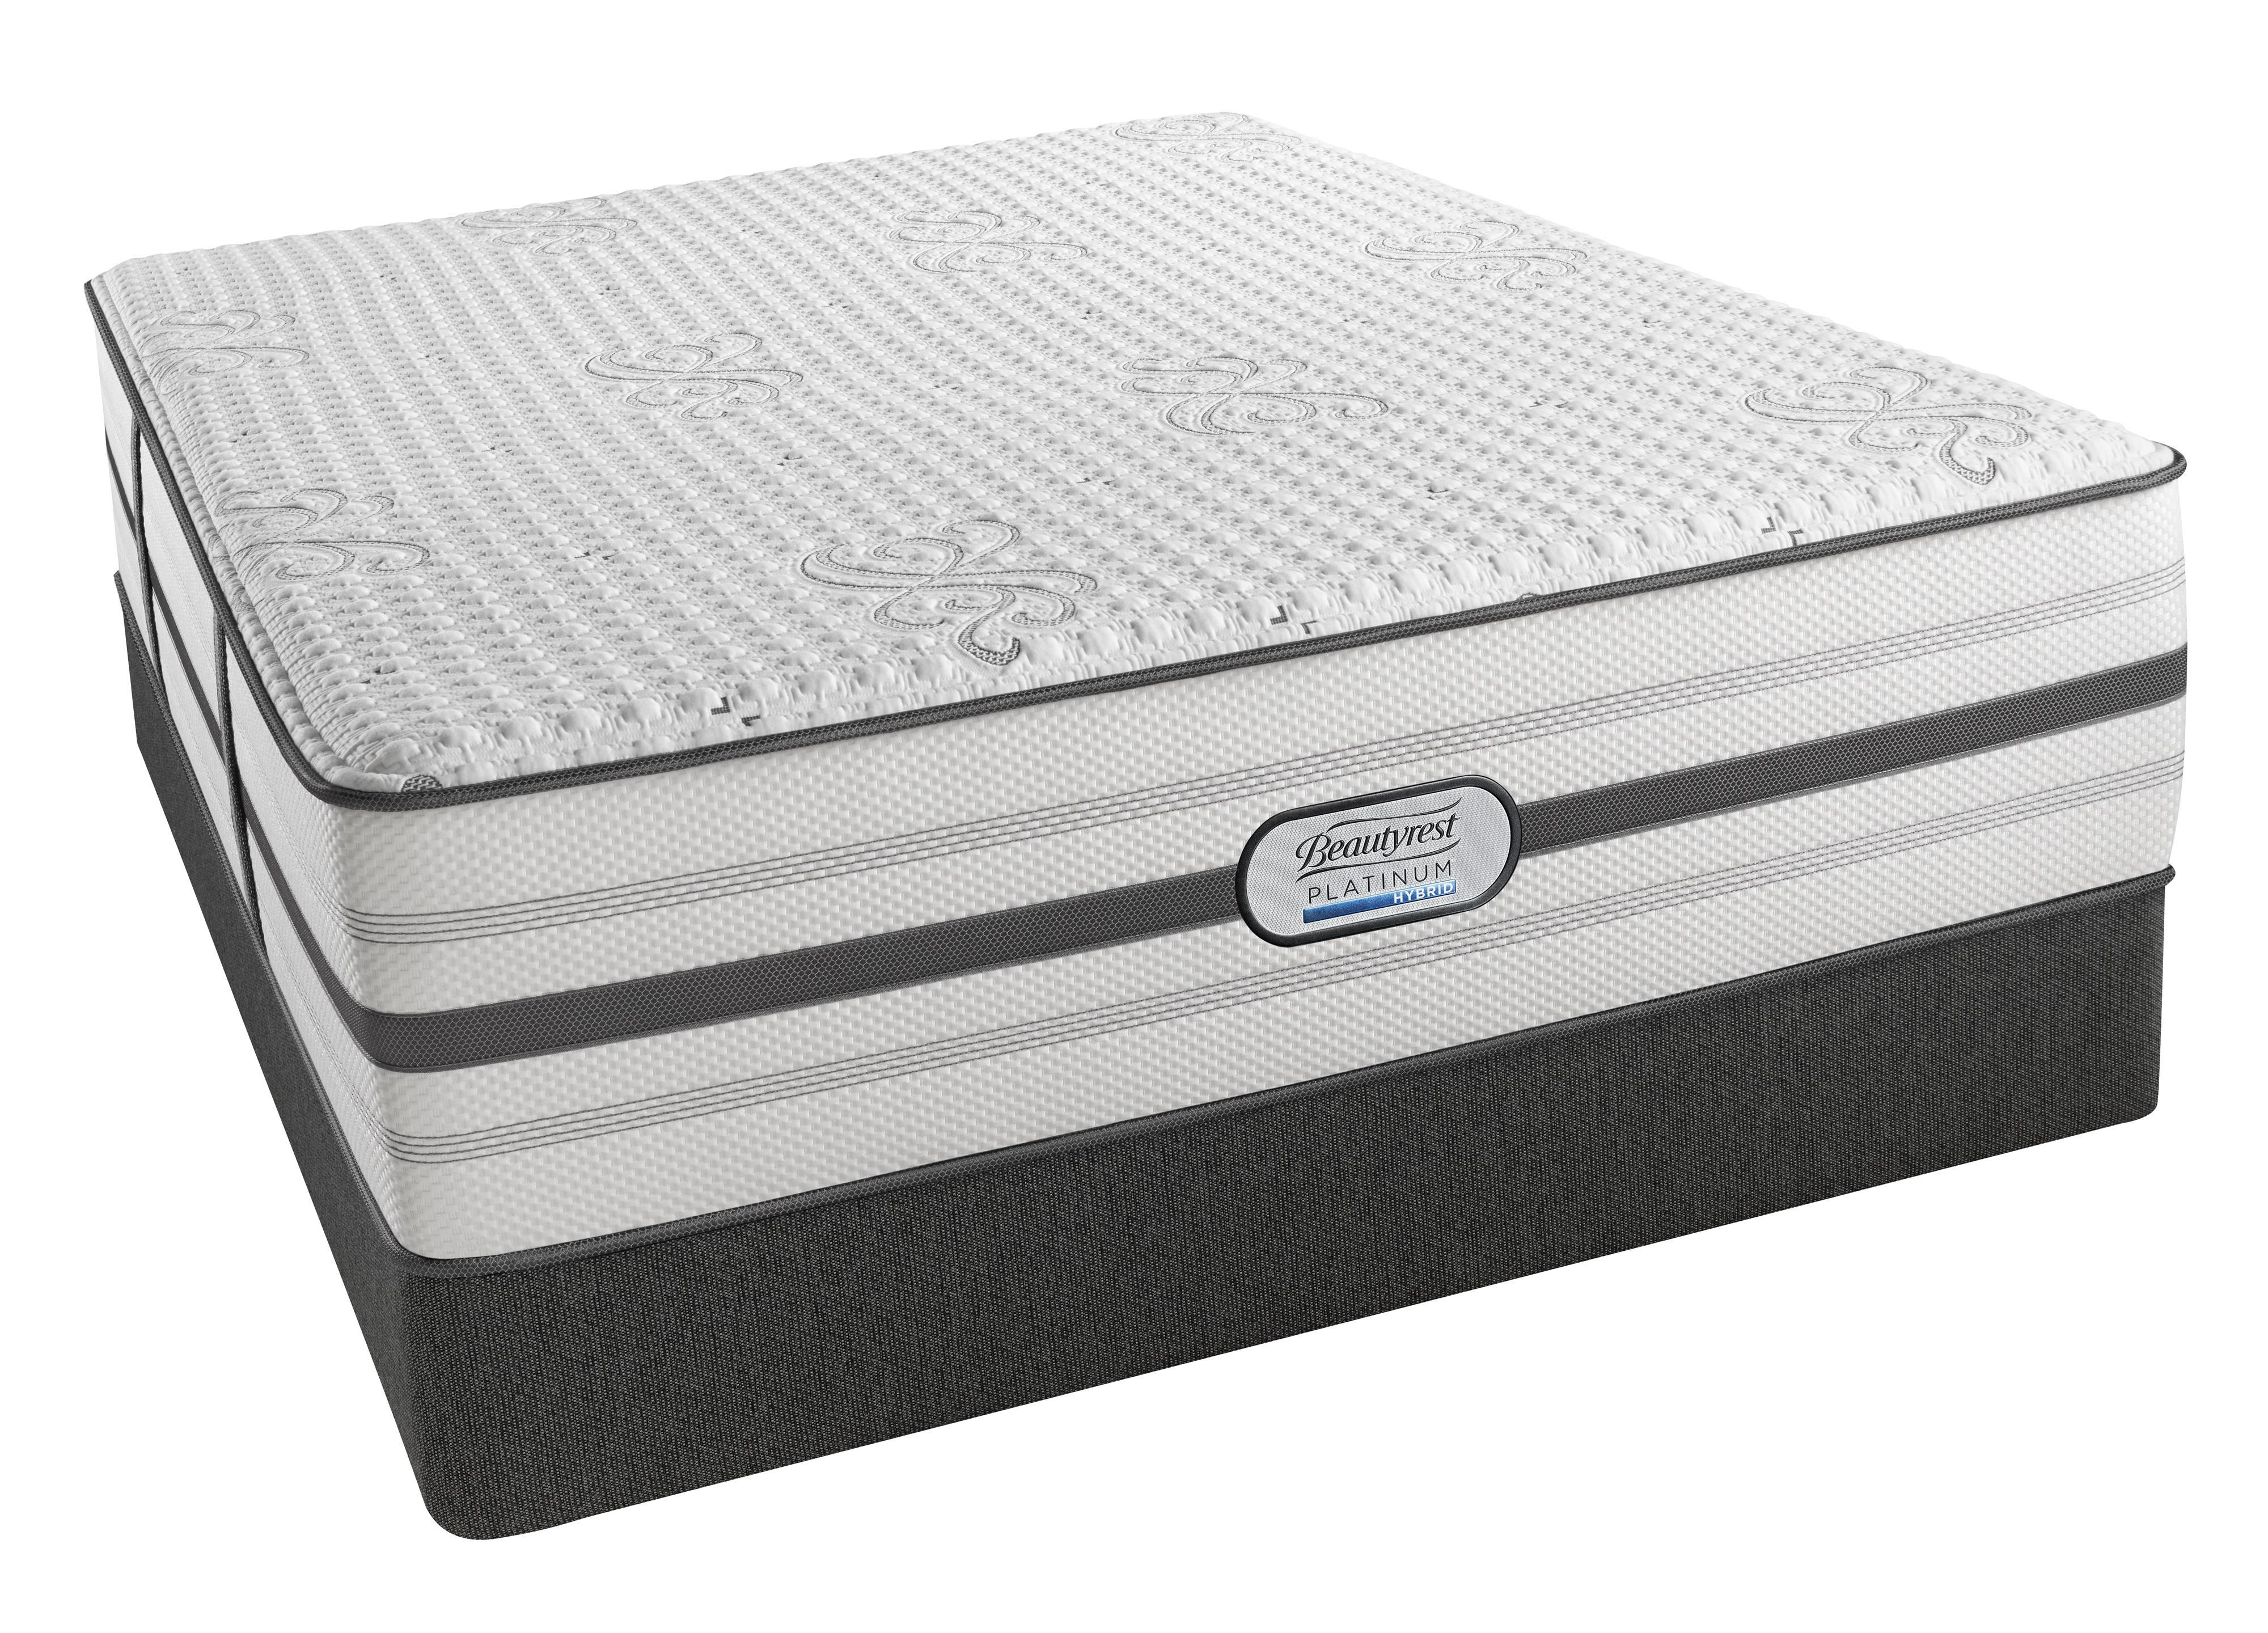 Beautyrest BR Platinum Hybrid Quinn Full Ultra Plush Hybrid Mattress Set - Item Number: BRHLV4UPL-F+50280F